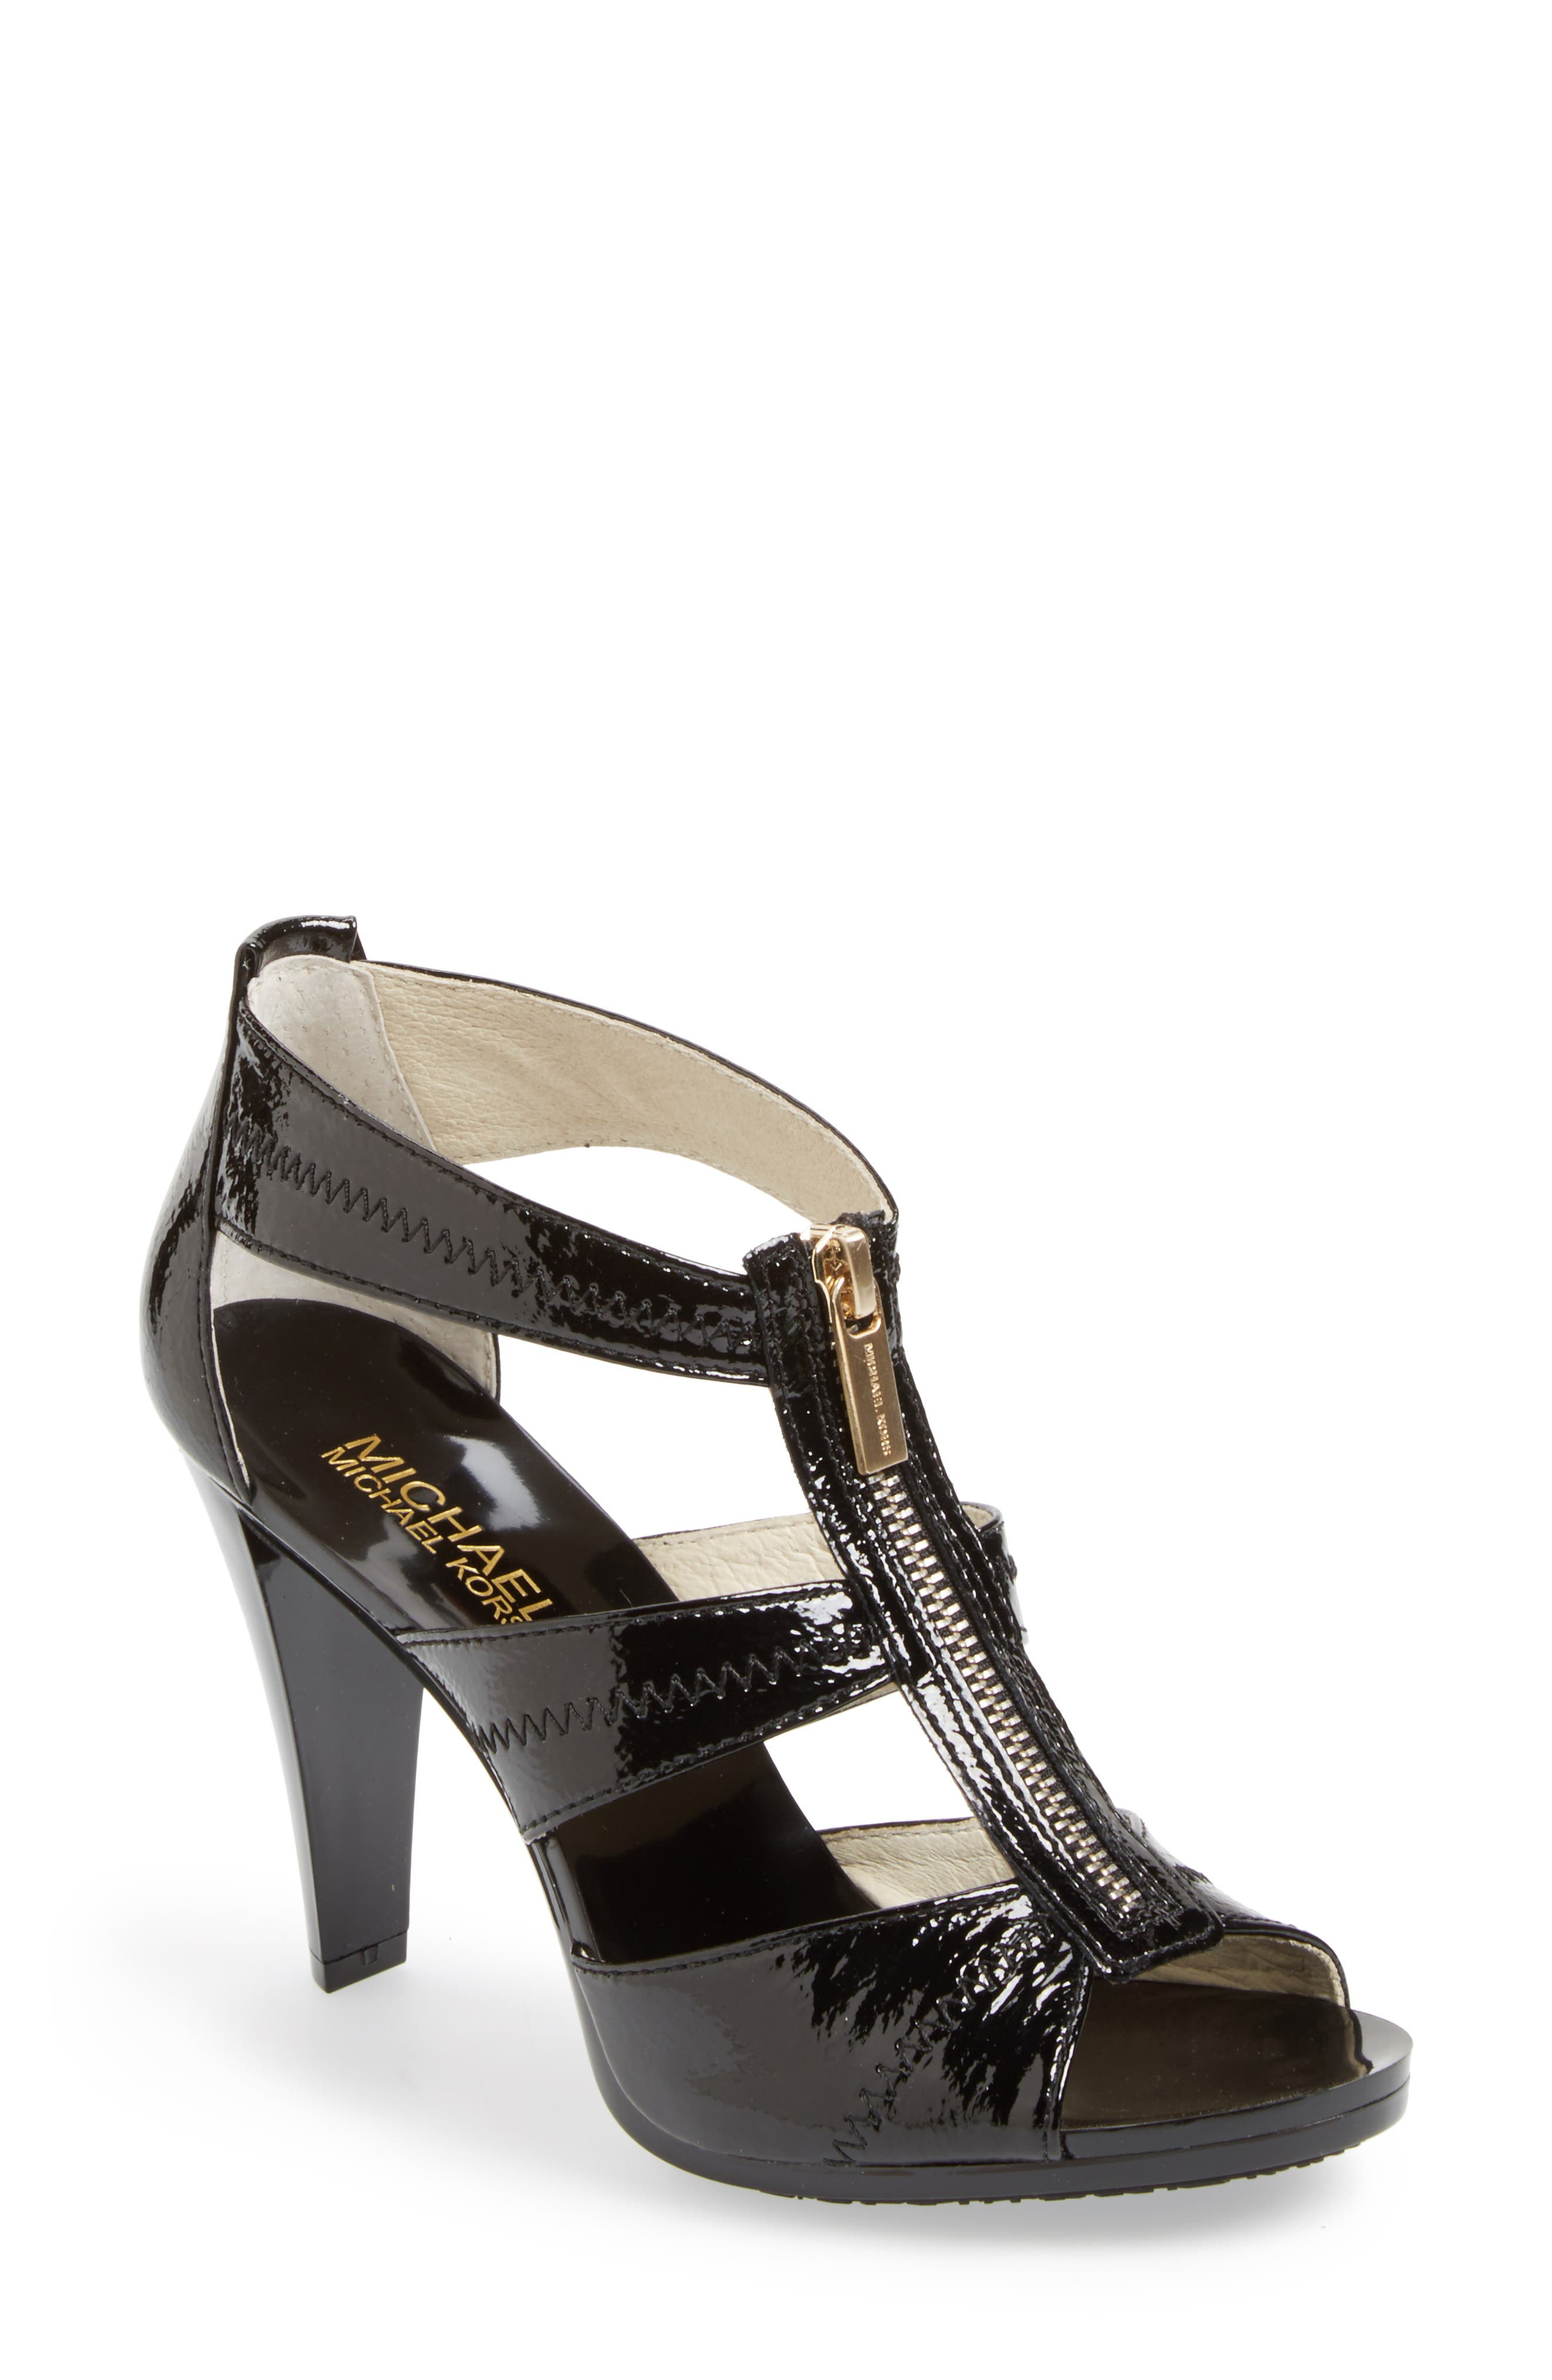 'Berkley' T-Strap Sandal,                             Main thumbnail 1, color,                             BLACK CRINKLED PATENT